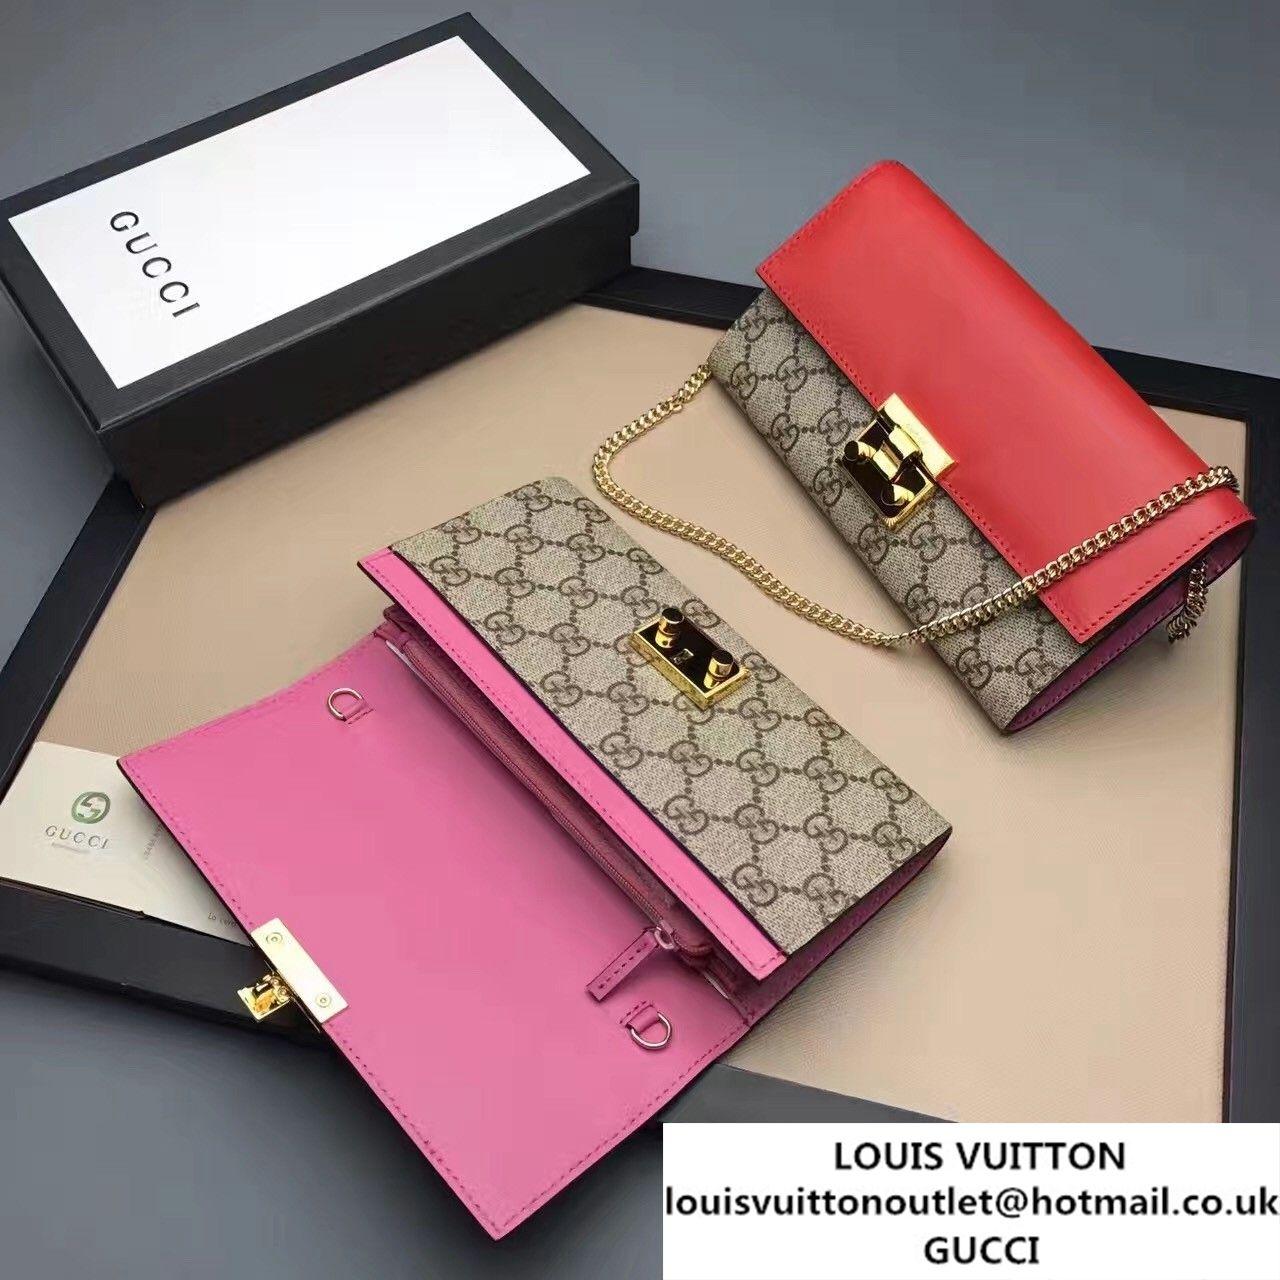 c64f89017a1 Gucci Padlock GG Supreme Continental Chain Wallet Bag 453506 Red Dark Pink  2017